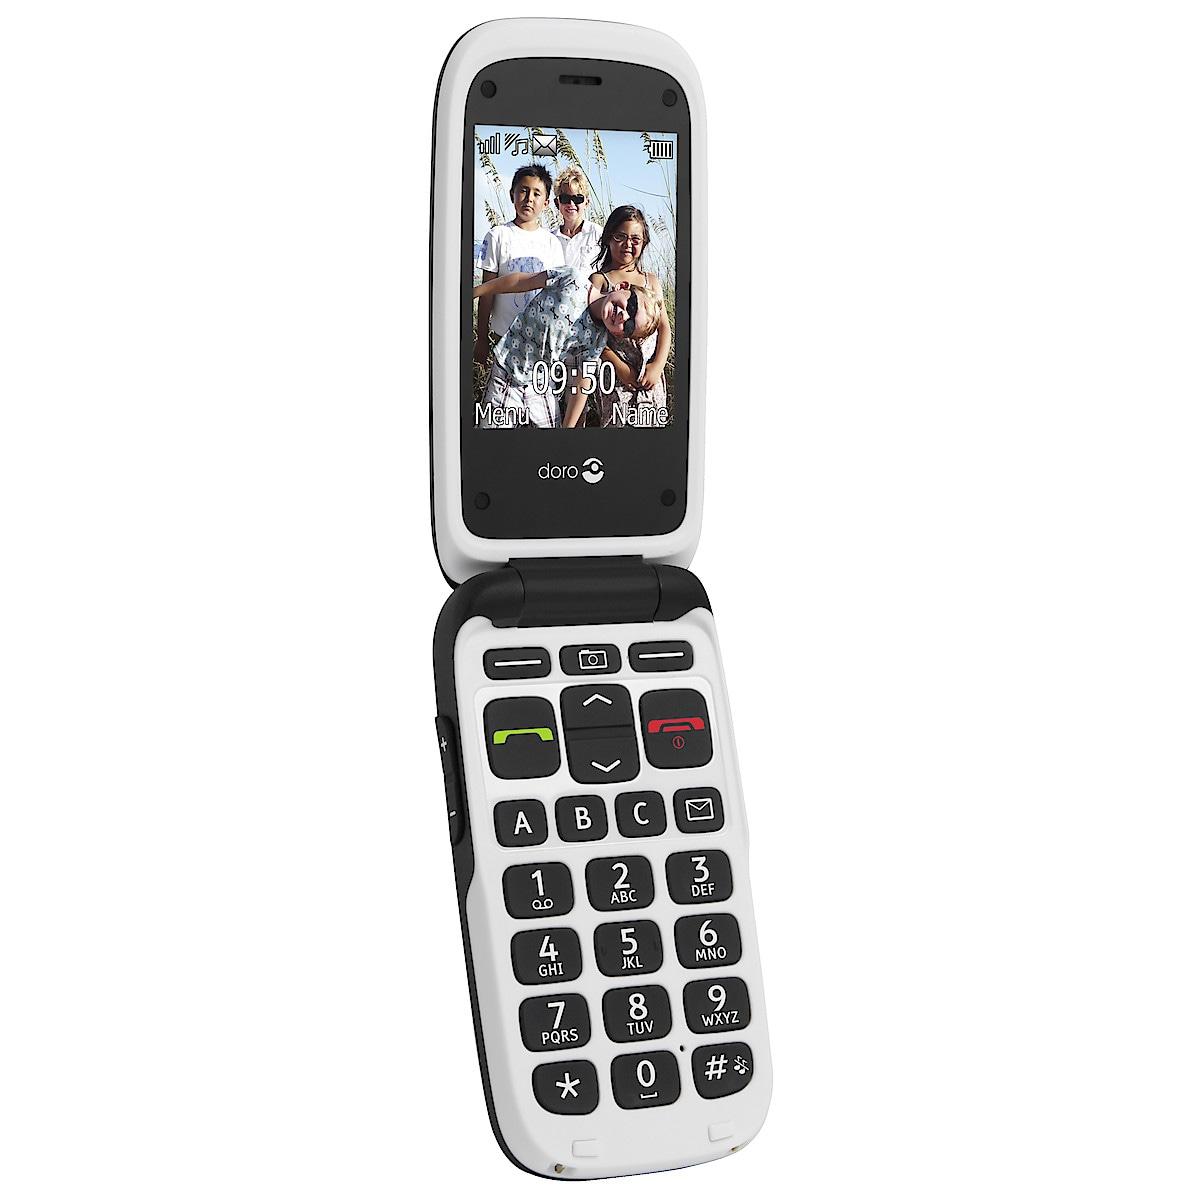 Doro PhoneEasy 612 mobiltelefon